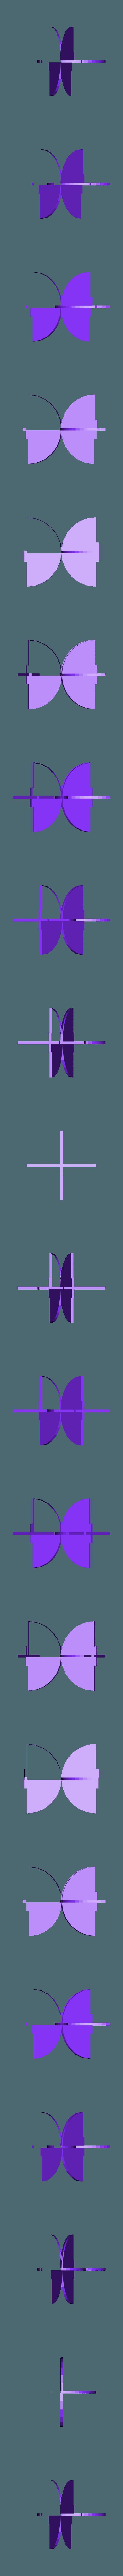 StratoMaker, Exhaust.stl Download free STL file Stratomaker Rocket Mascot • 3D print model, cmcdow